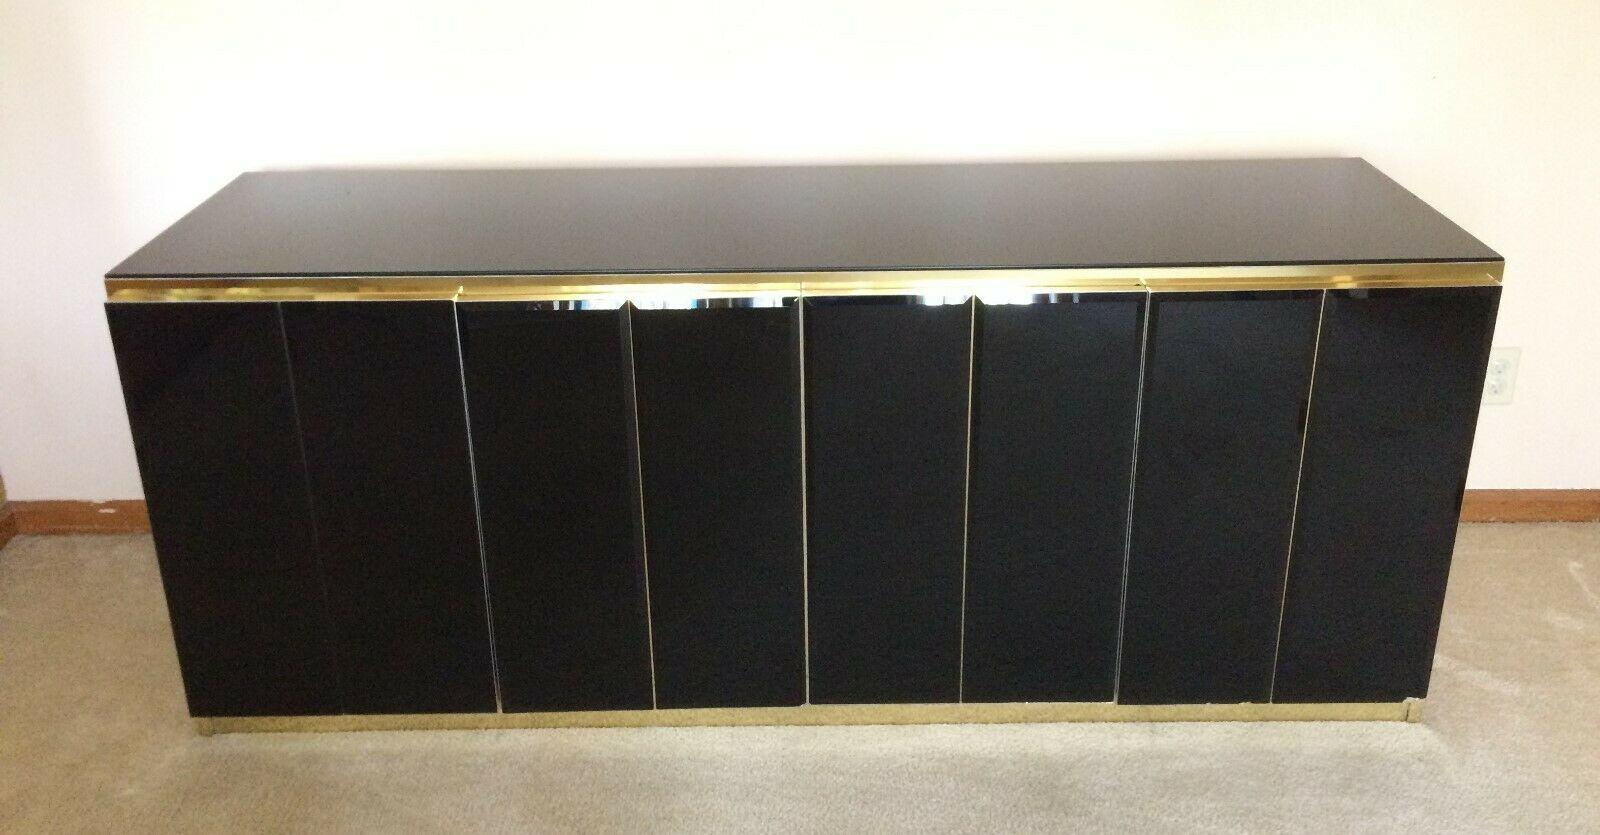 Ello: Credenza * Early Black Glass & Brass Design * 4 Door * Very Good Condition Intended For Current Kieth 4 Door Credenzas (View 16 of 20)